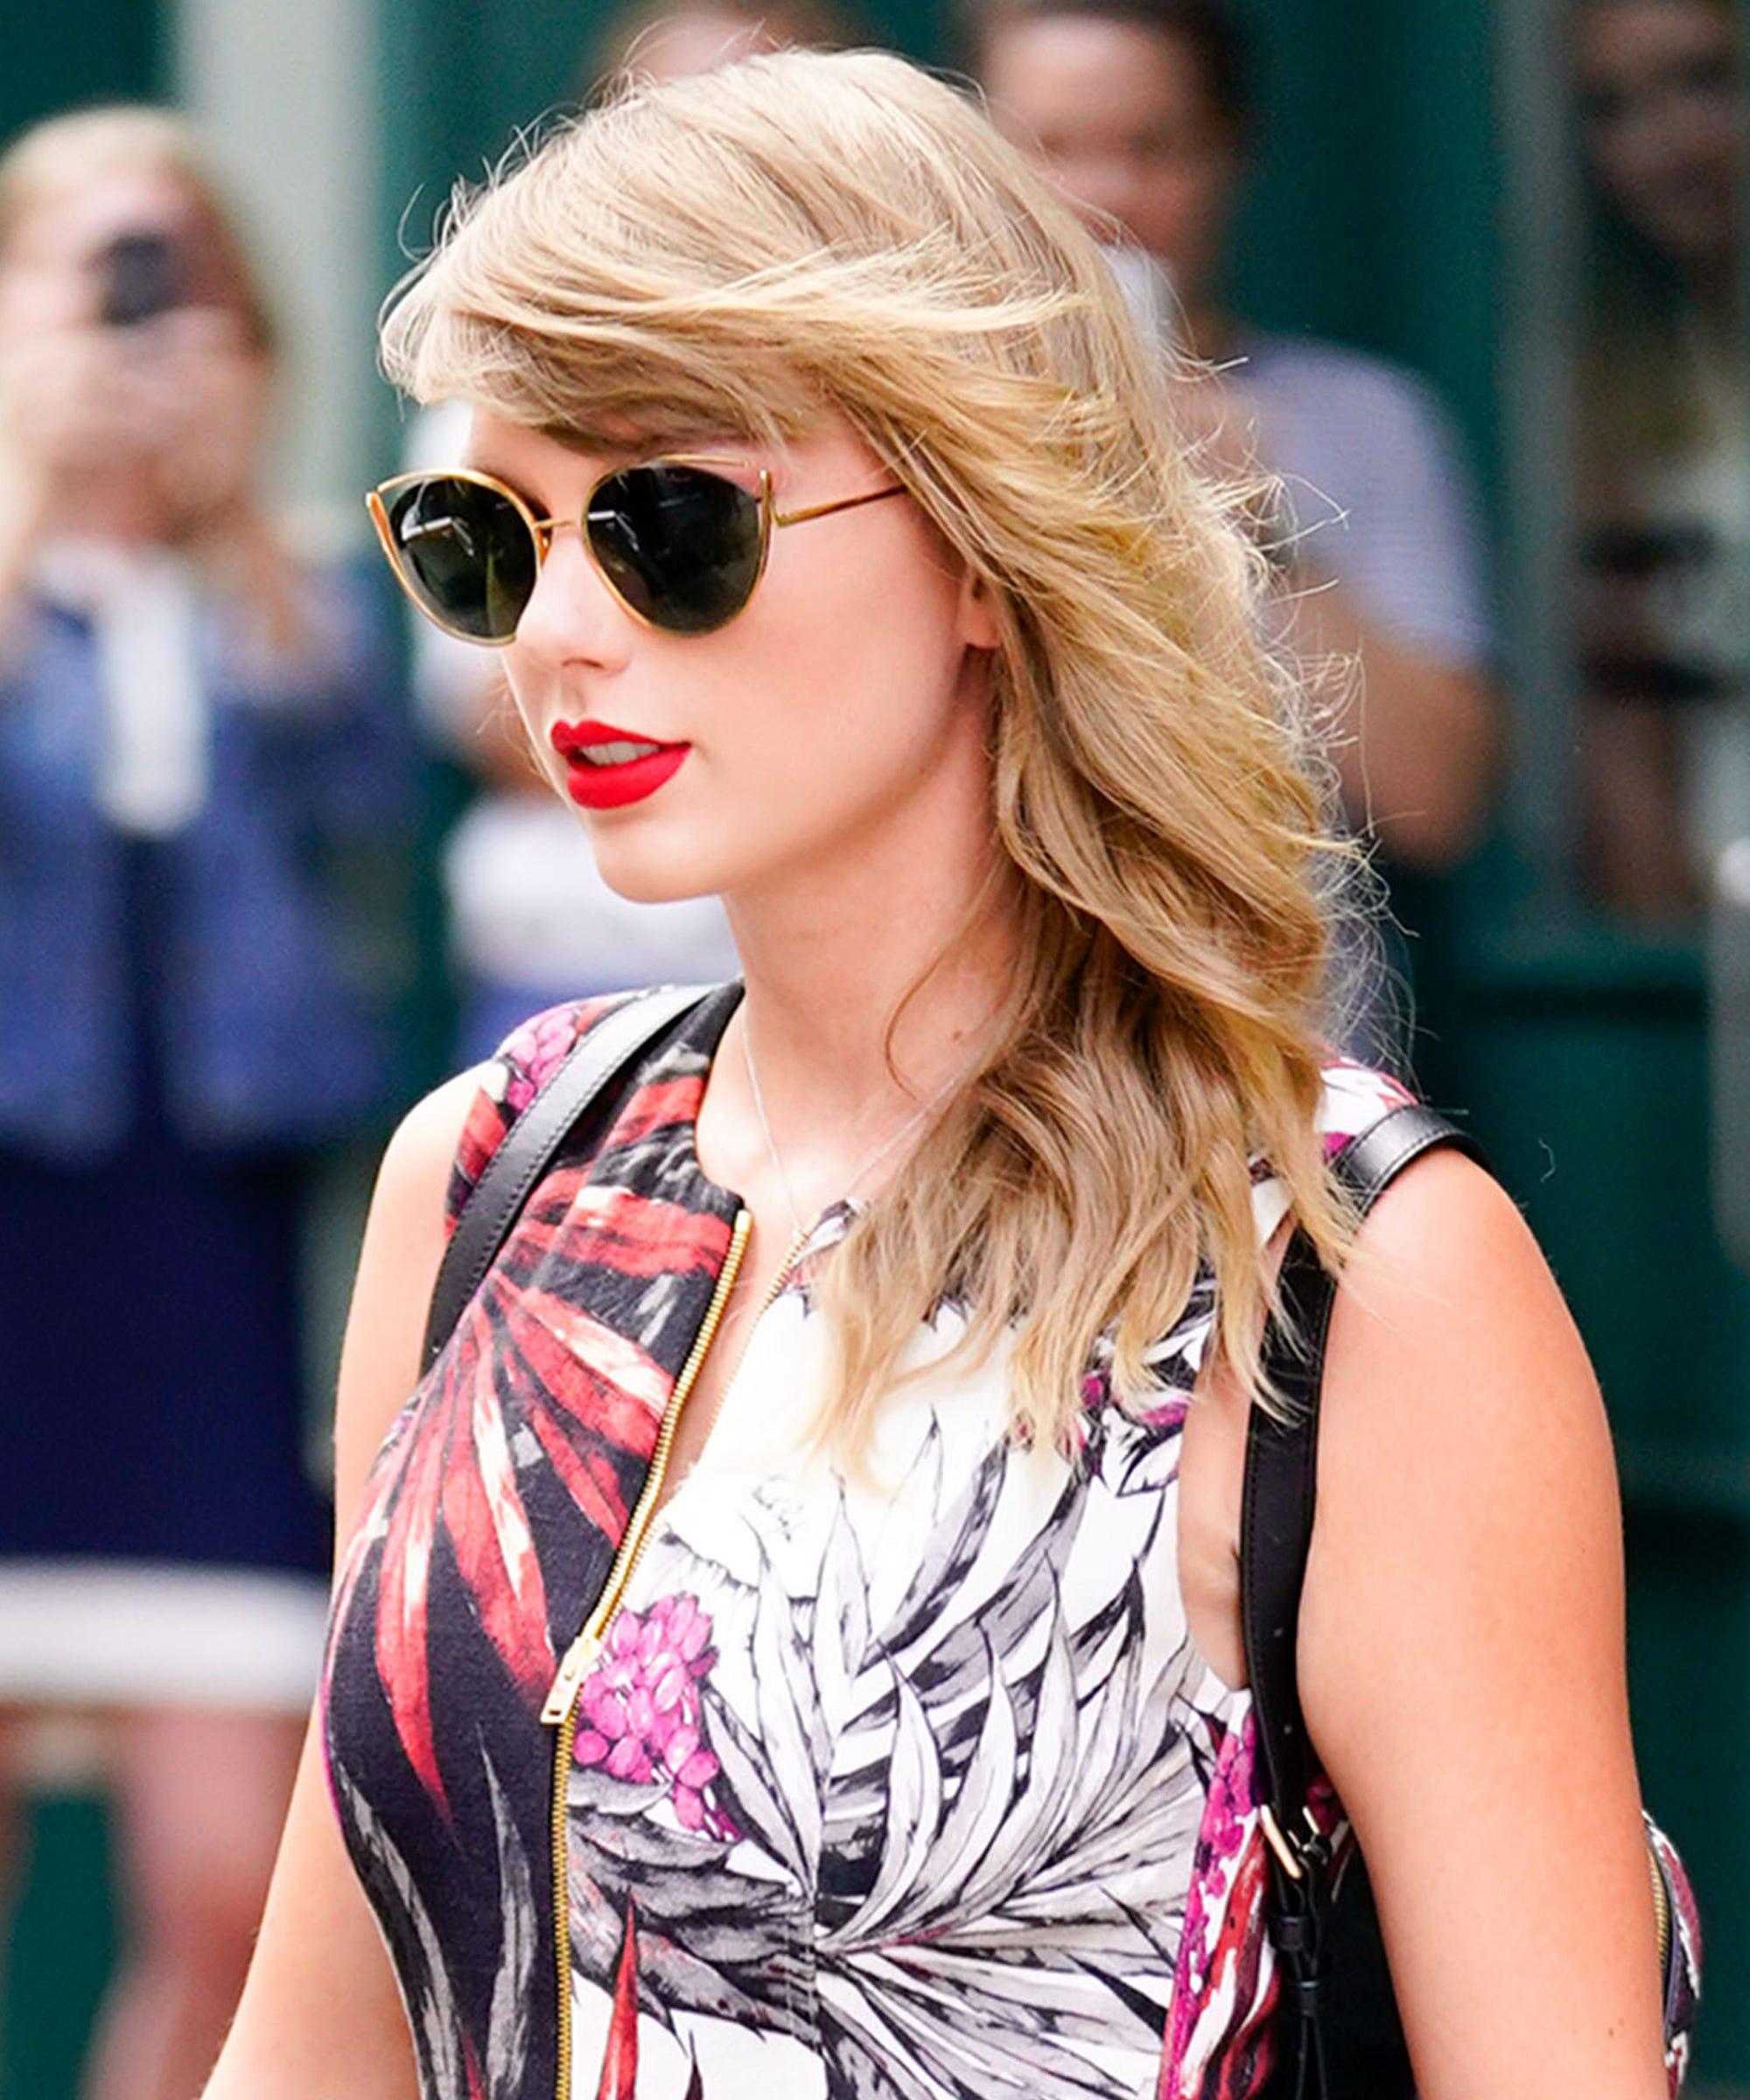 d8f34edcf59 Taylor Swift RevealsName Of Her 3rd Cat & It's A Boy